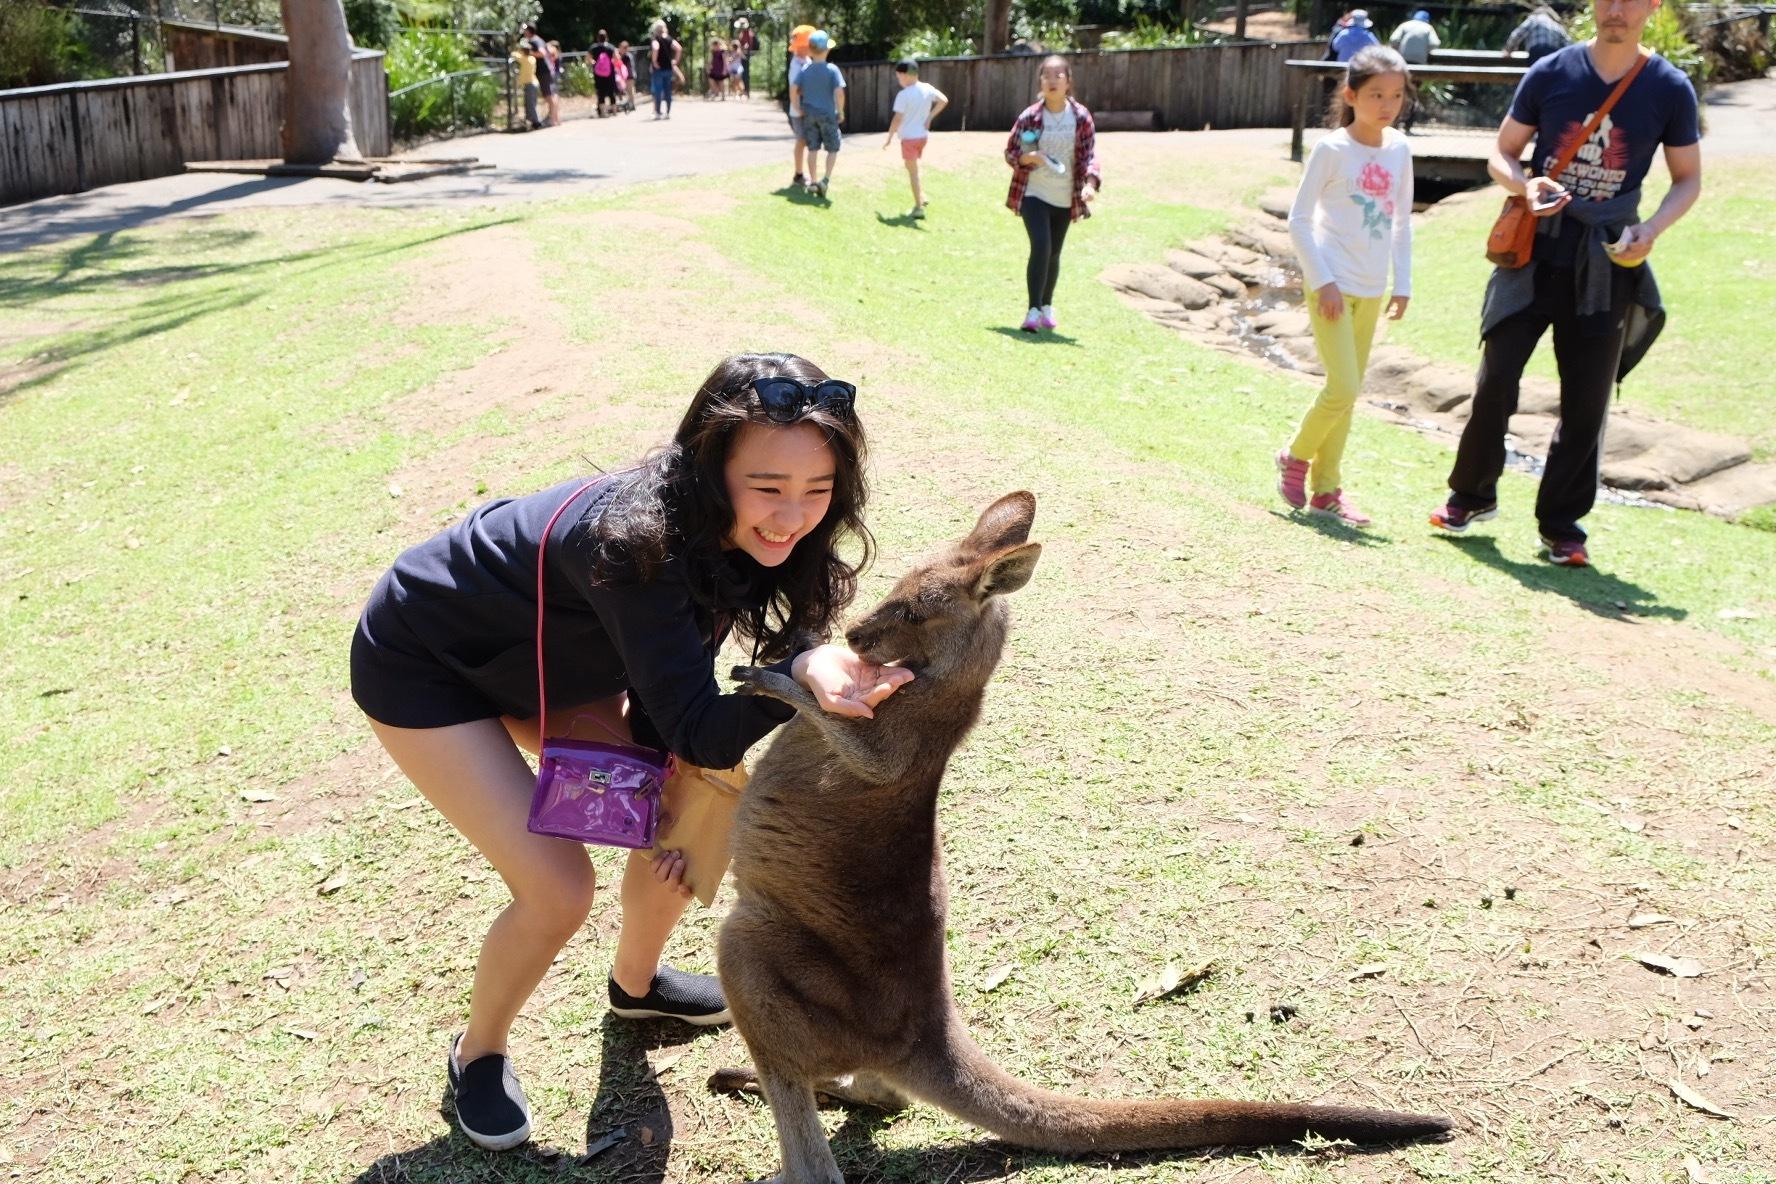 Trip ke Australia kurang lengkap kalau ga foto bareng yang satu ini ;)